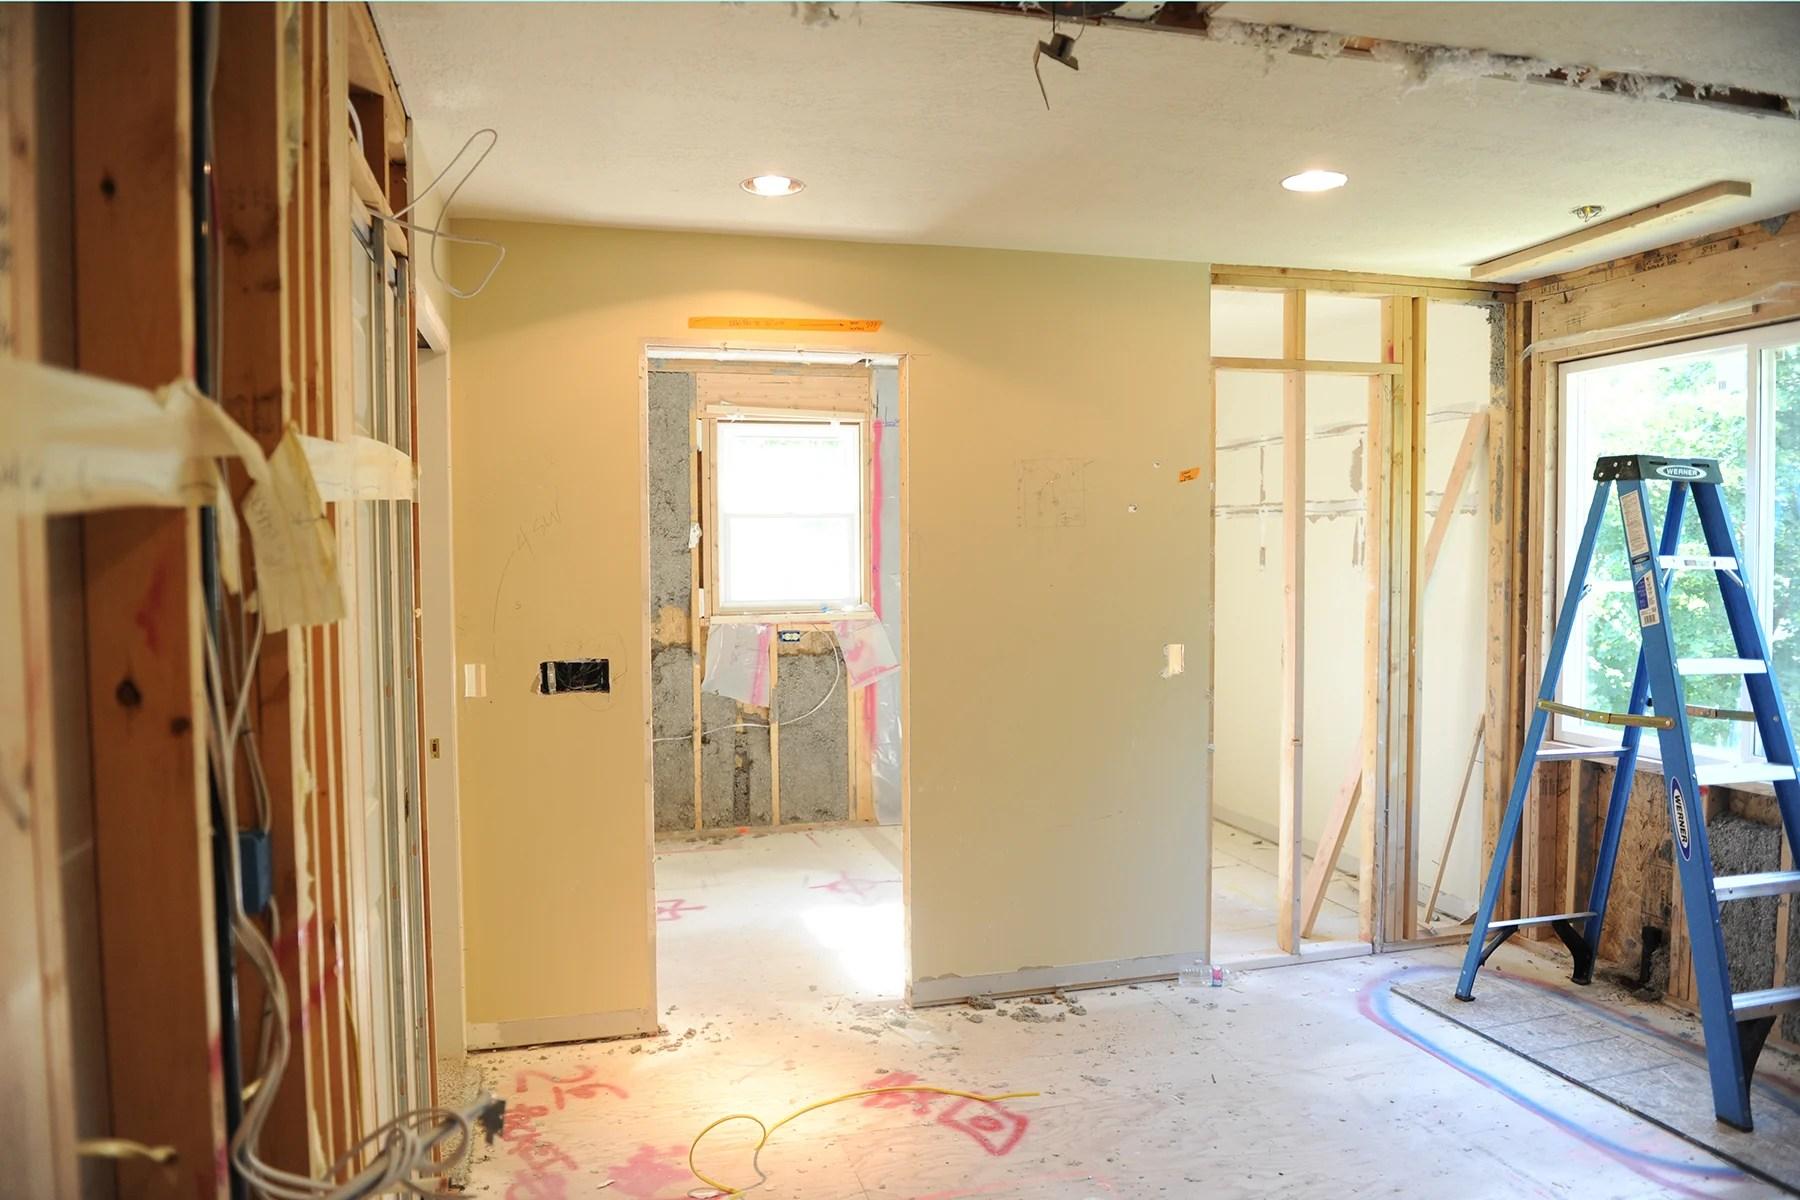 Bathroom Remodel Ideas.Master Bathroom Remodel Renovation Idea Before And After